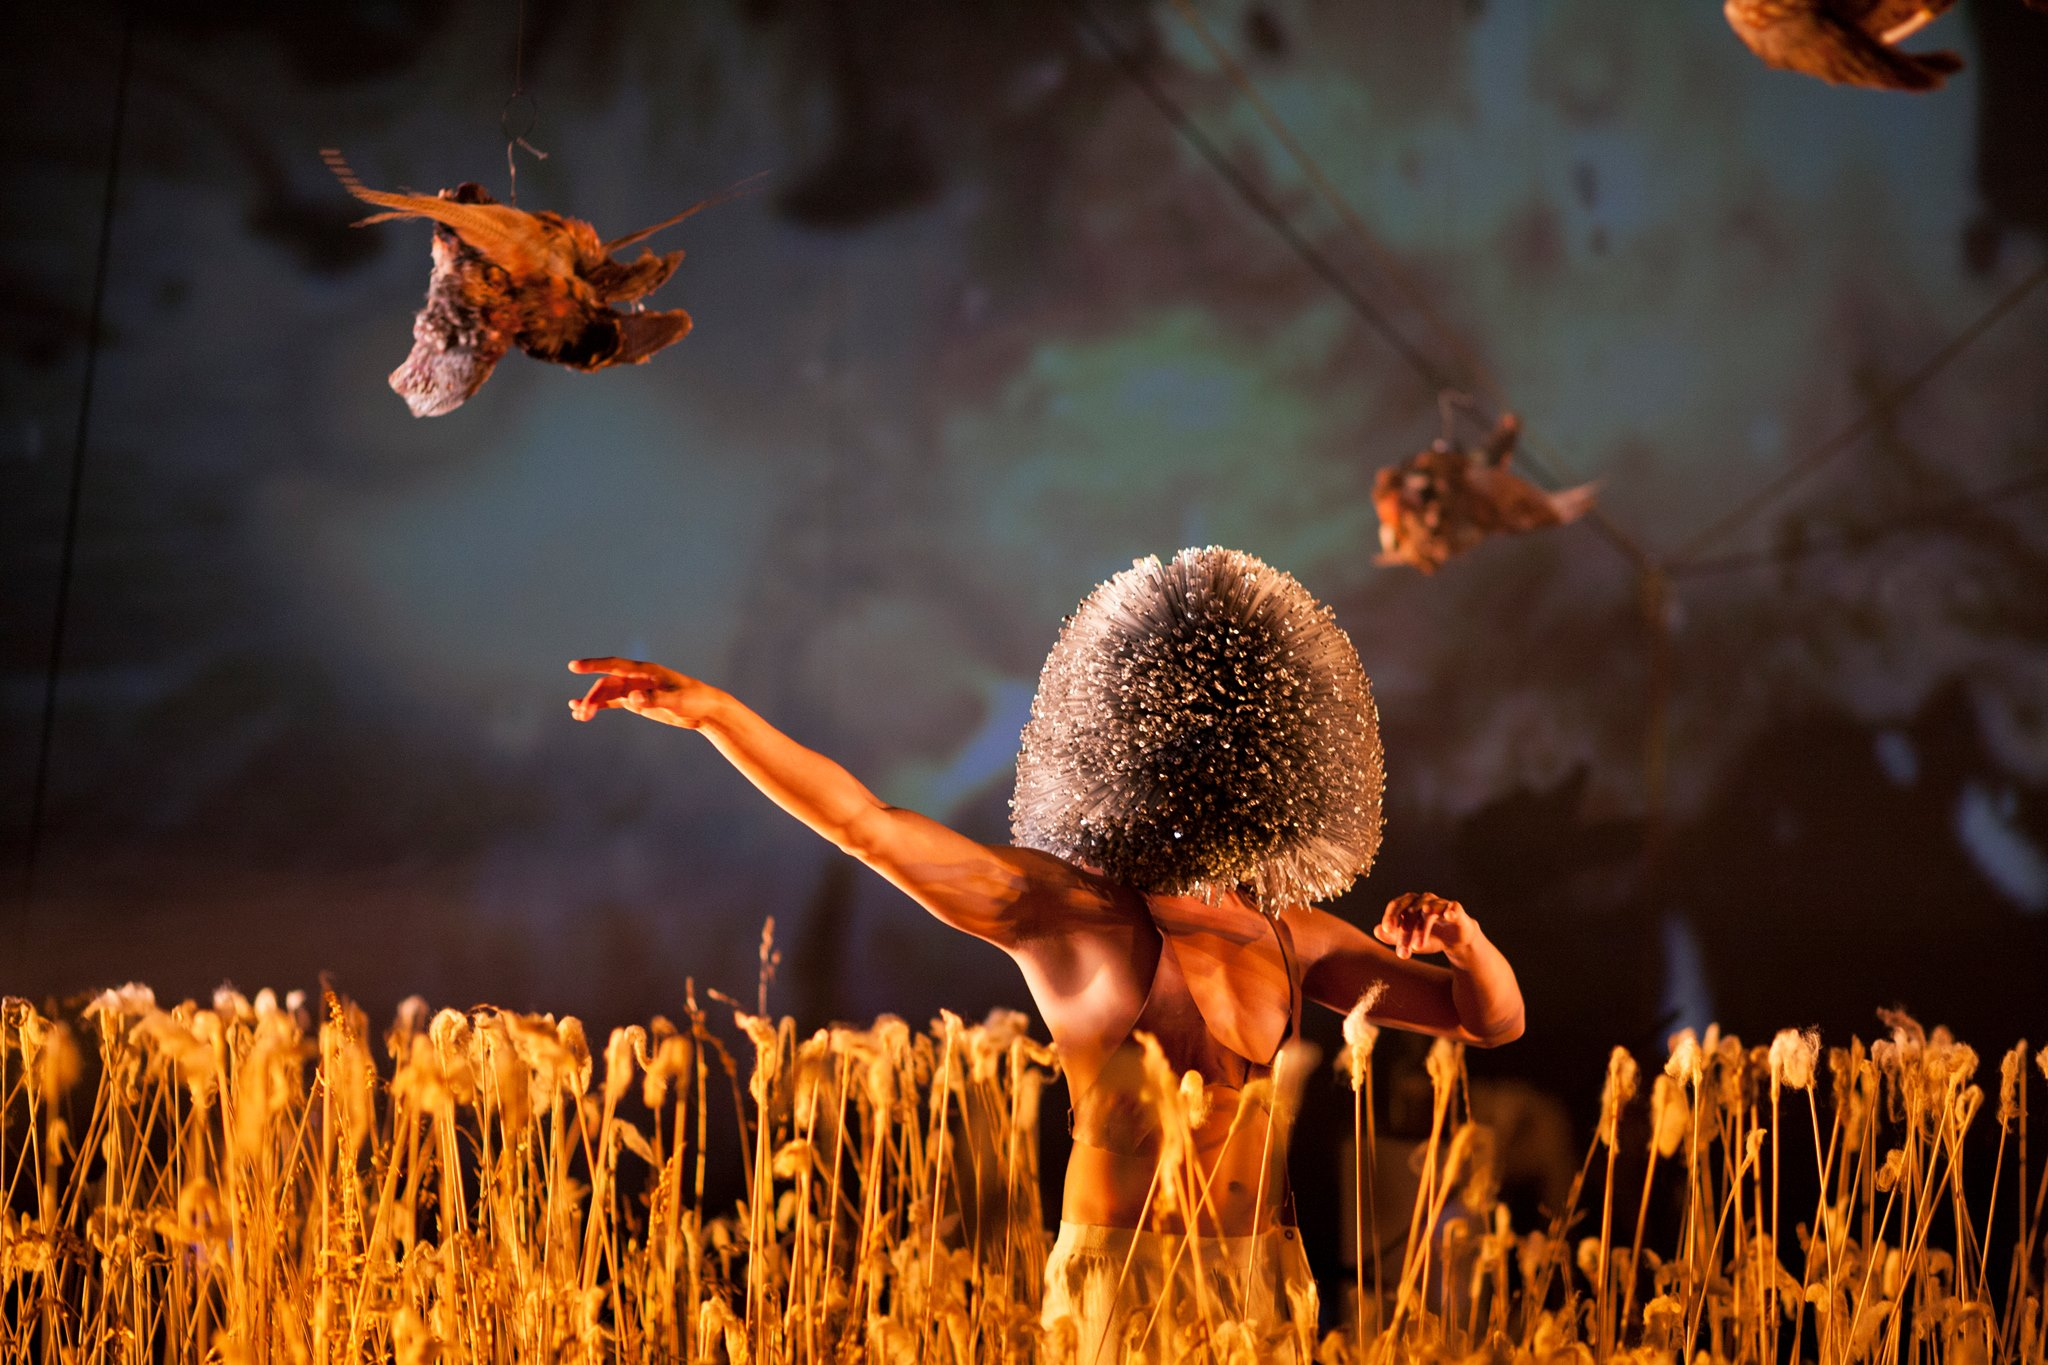 Saint Genet Paradisiacal Rites (Theater)